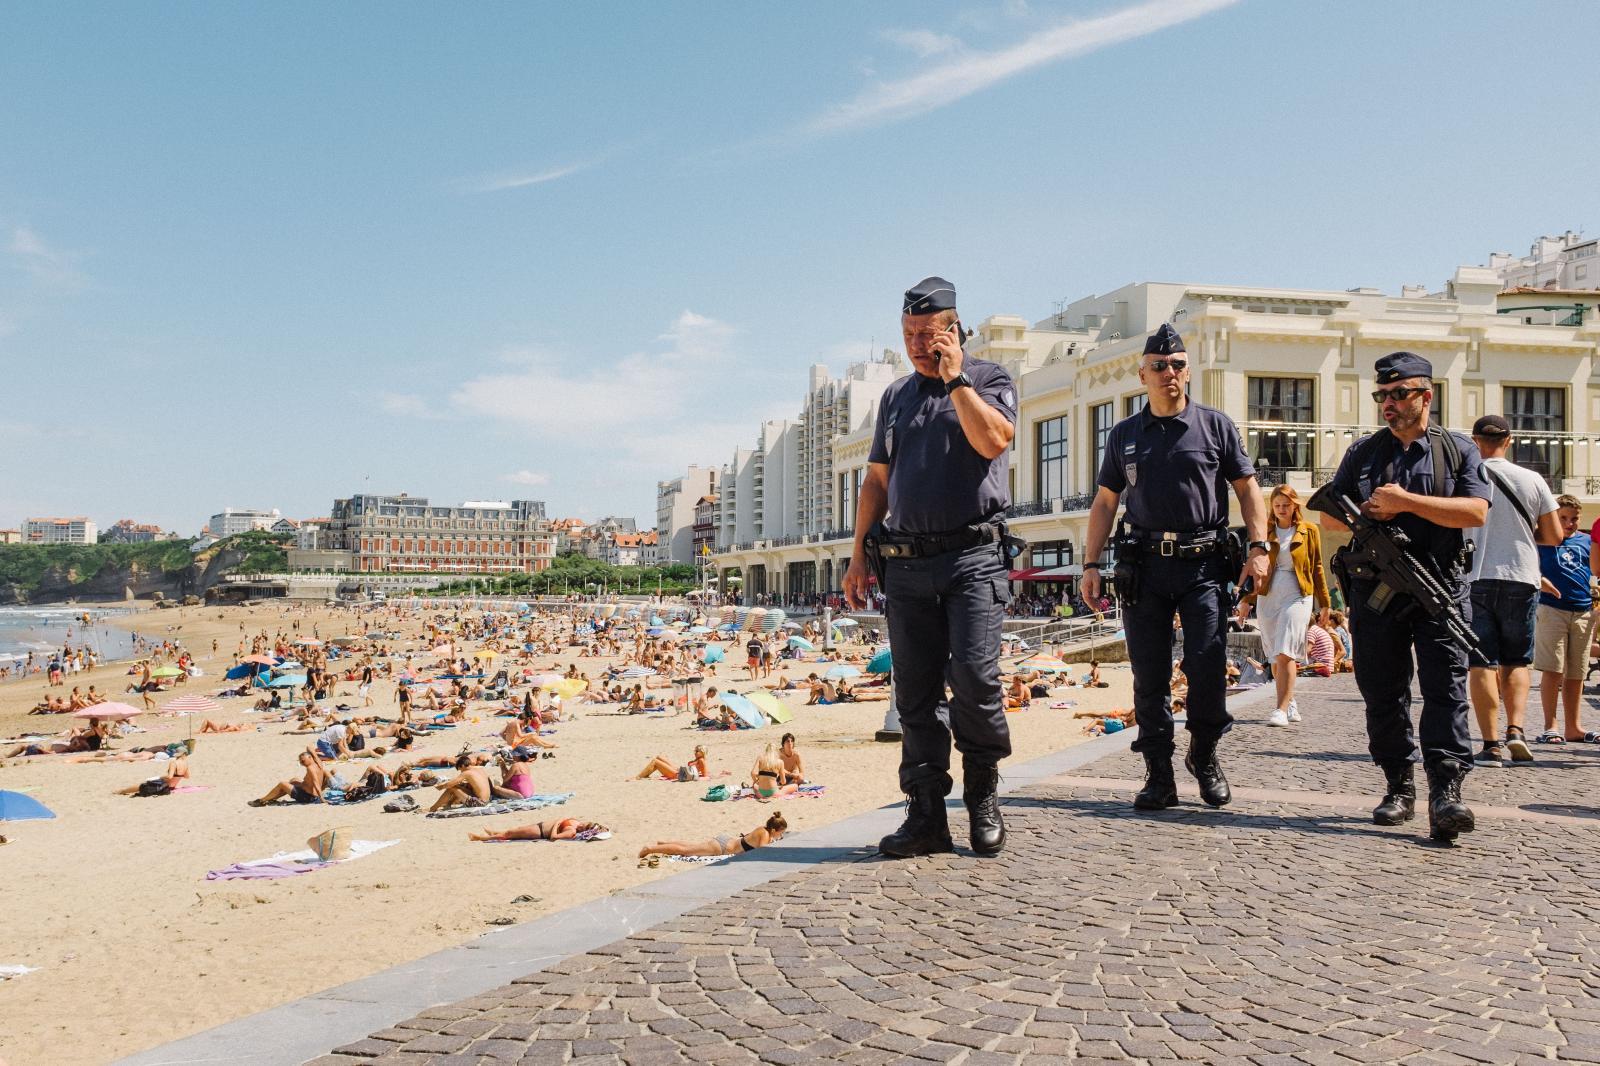 Photography image - Loading g7-summit-biarritz__1.jpg